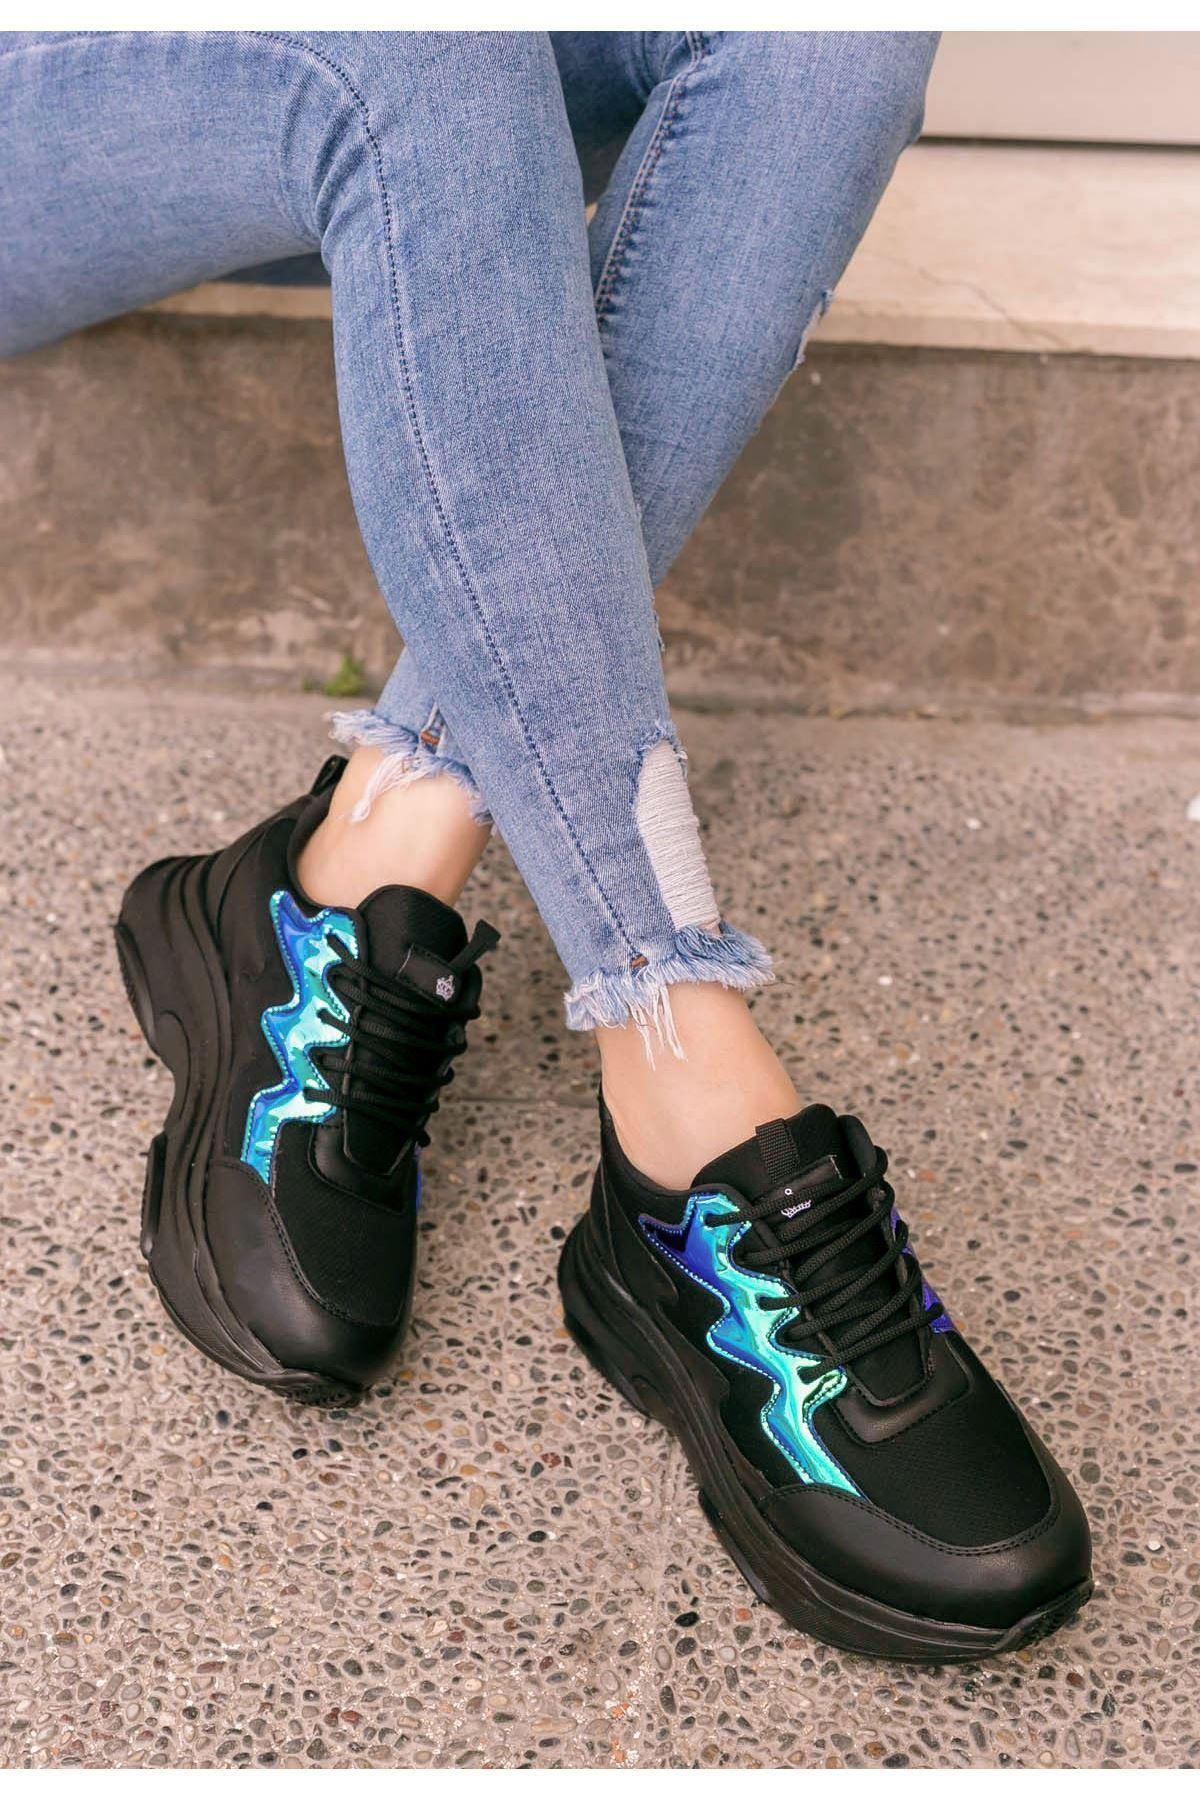 Katalina Siyah Cilt Hologramlı Spor Ayakkabı